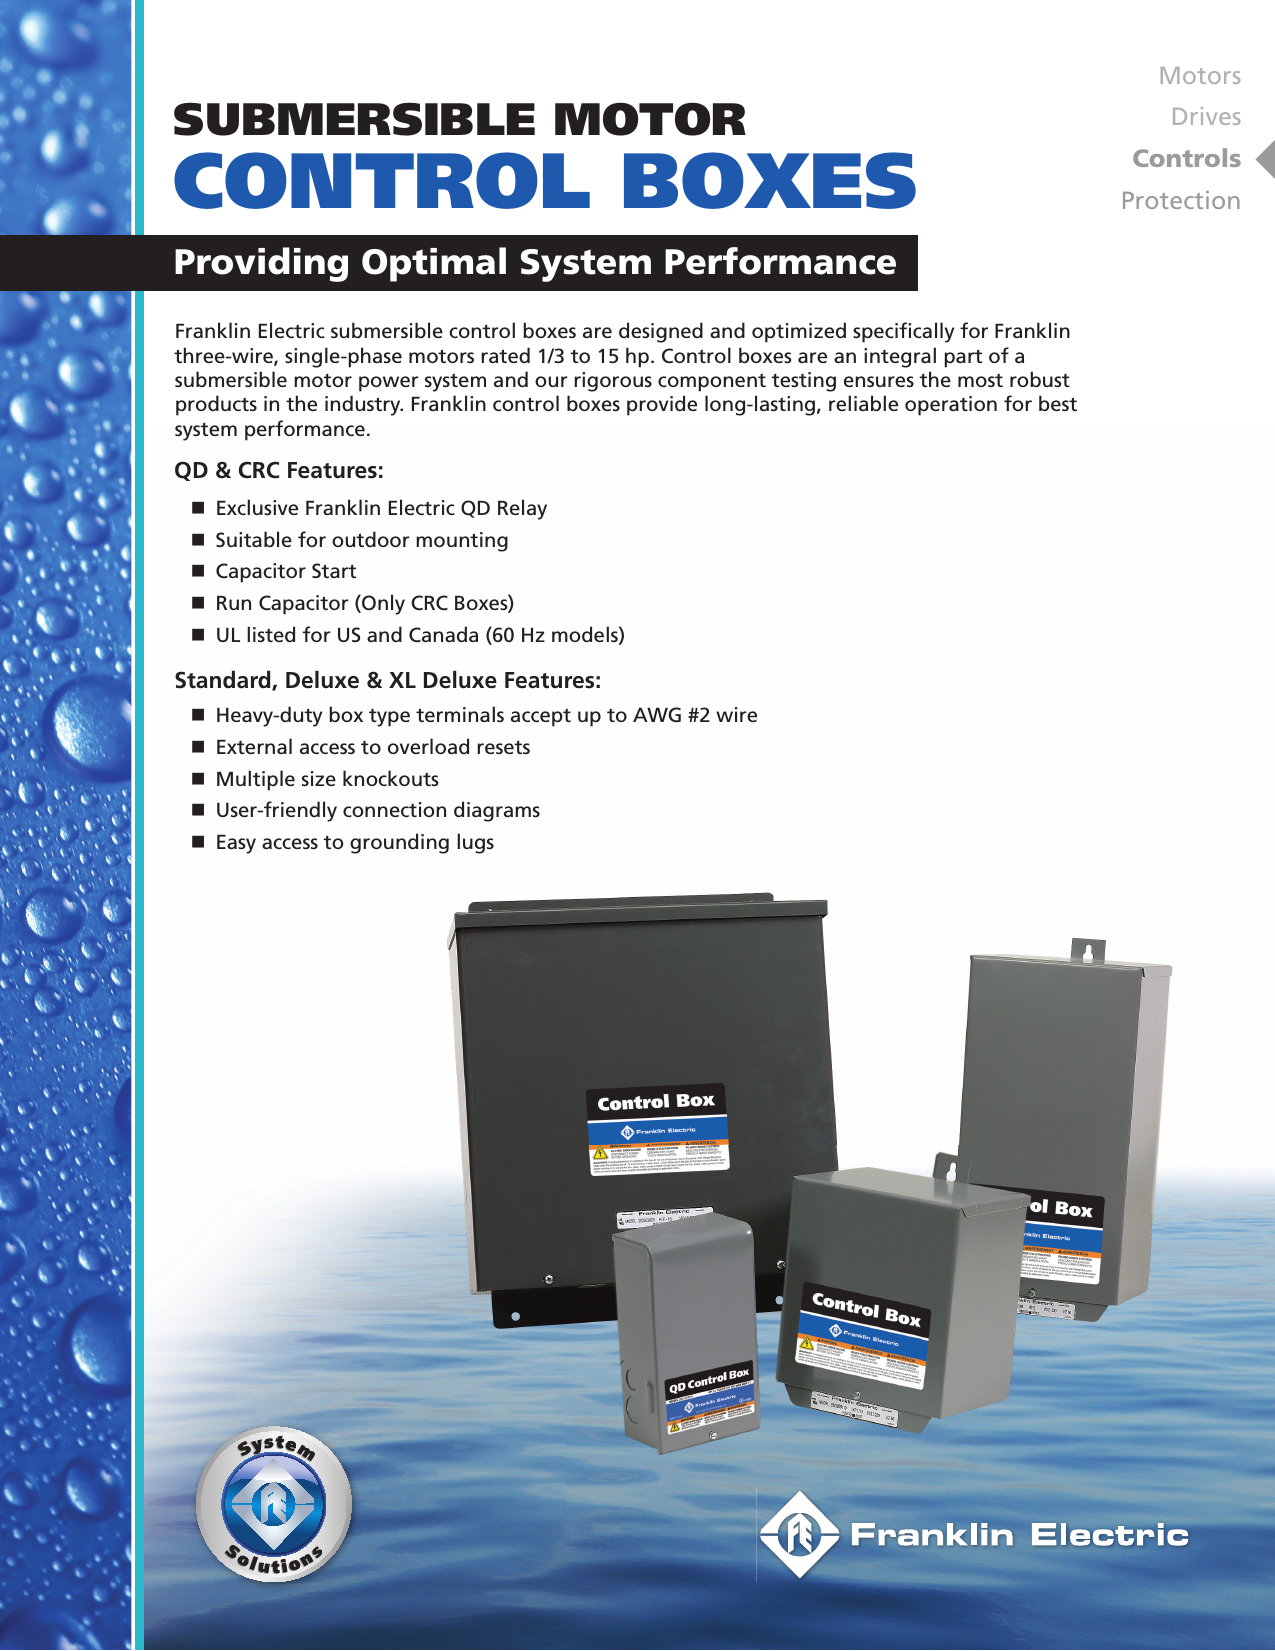 18131 1 Franklin Electric Control Box Brochure M1330 Boxes 03 09 Qd Wiring User Manual